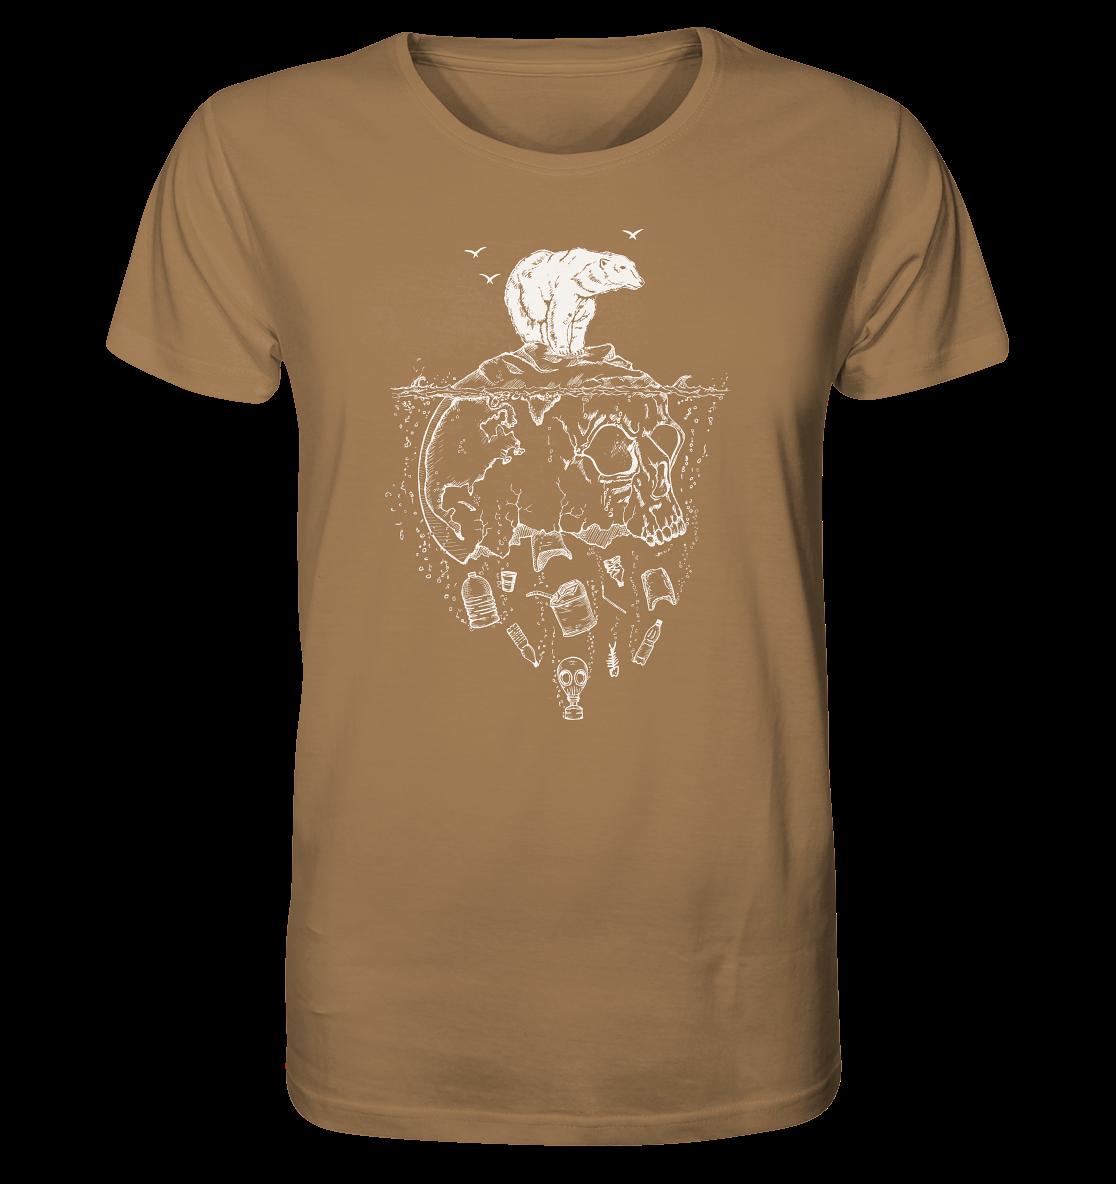 front-organic-shirt-a17c55-1116x-10.png